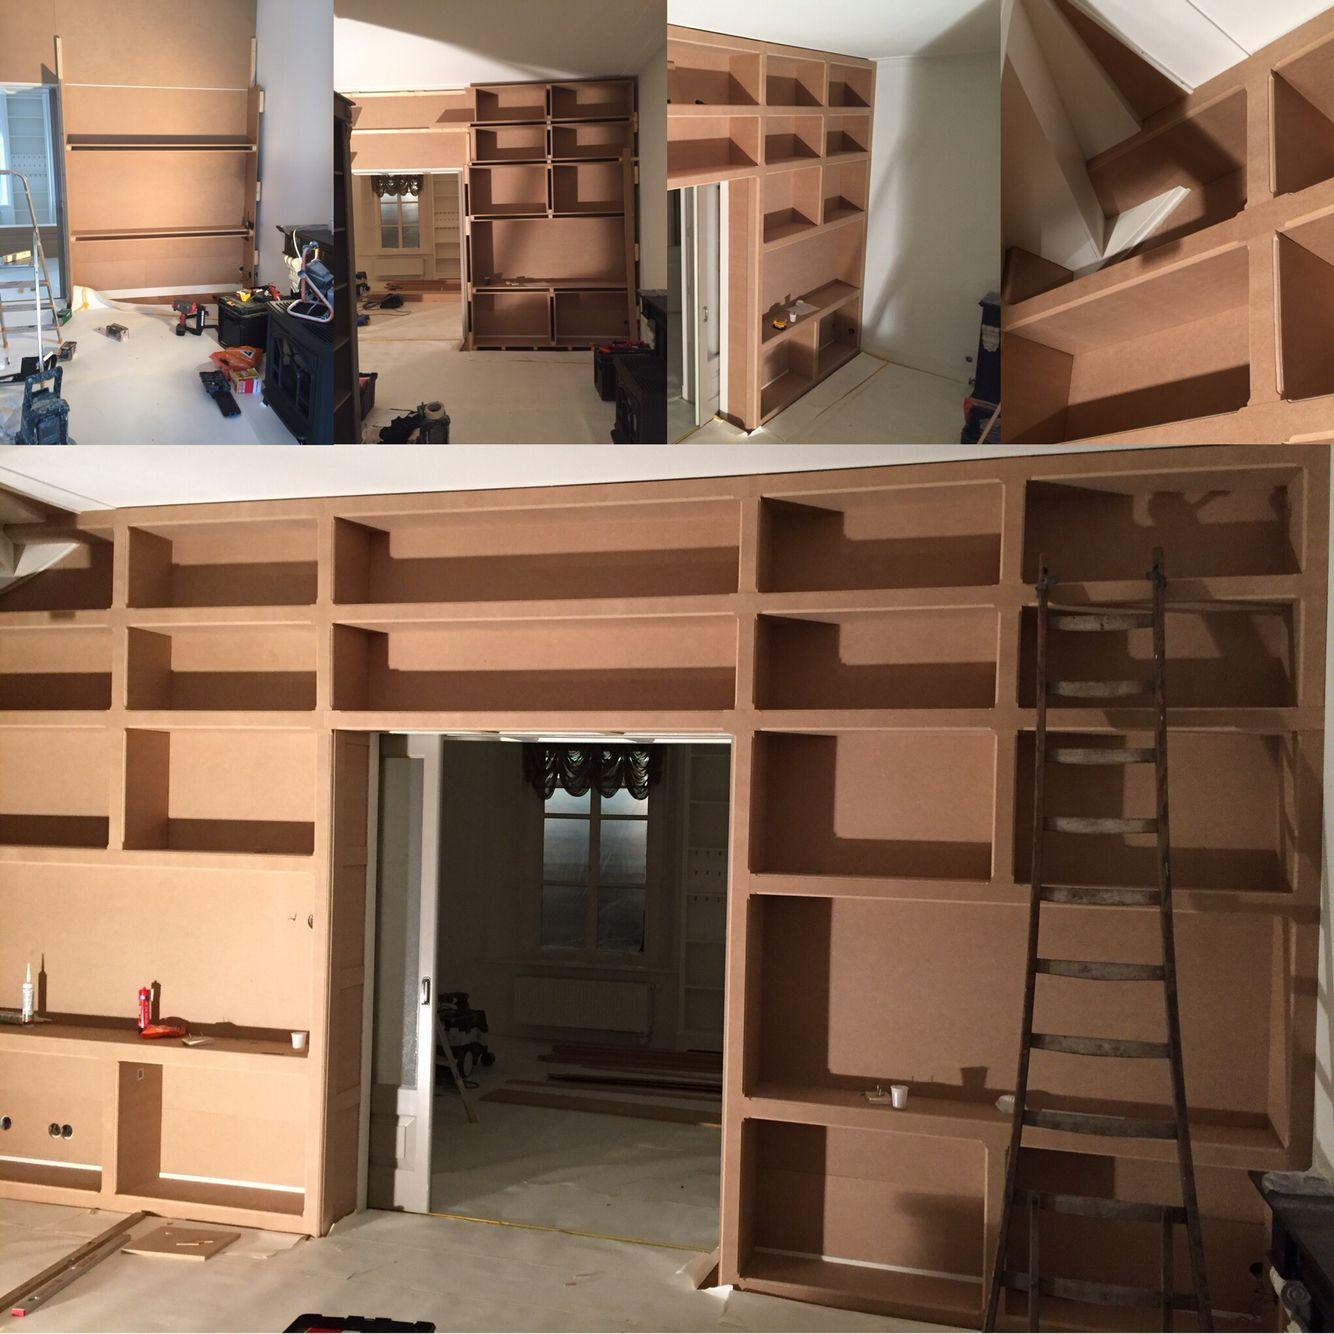 grote boekenkast in aanbouw 650x325m